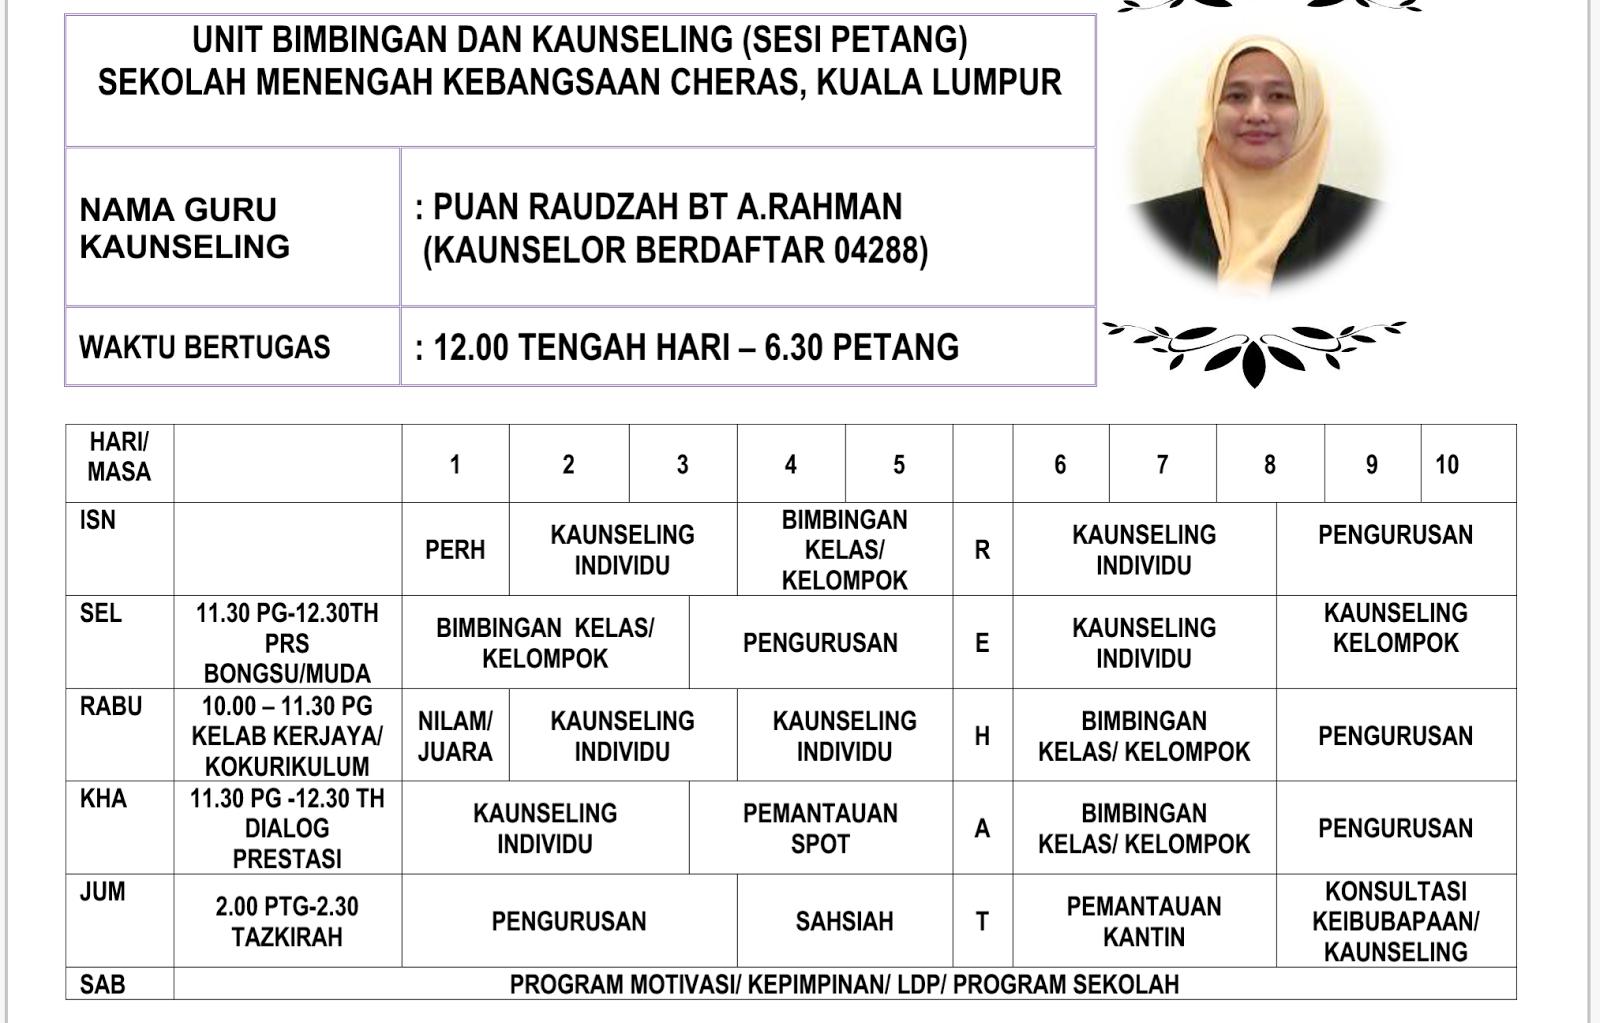 Kaunselor Nurhaiza Che Mat Jadual Waktu Guru Kaunseling Smk Cheras 2018